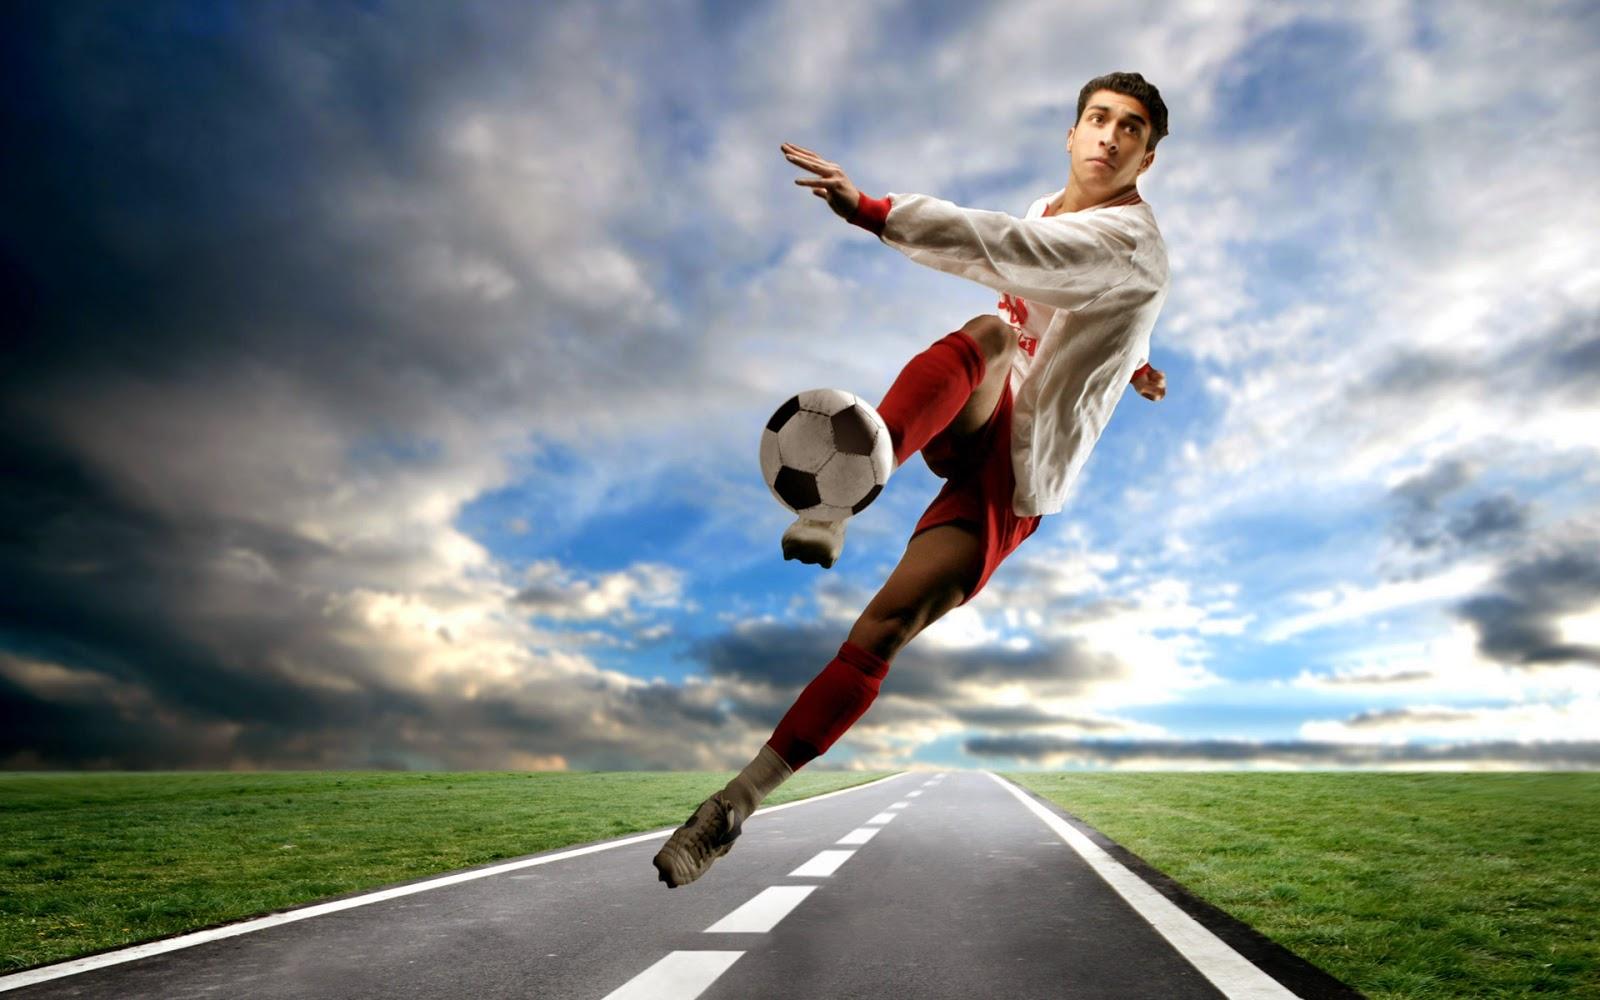 http://www.ozoneeleven.com/wp-content/uploads/2010/07/HD_Soccer_27.jpg